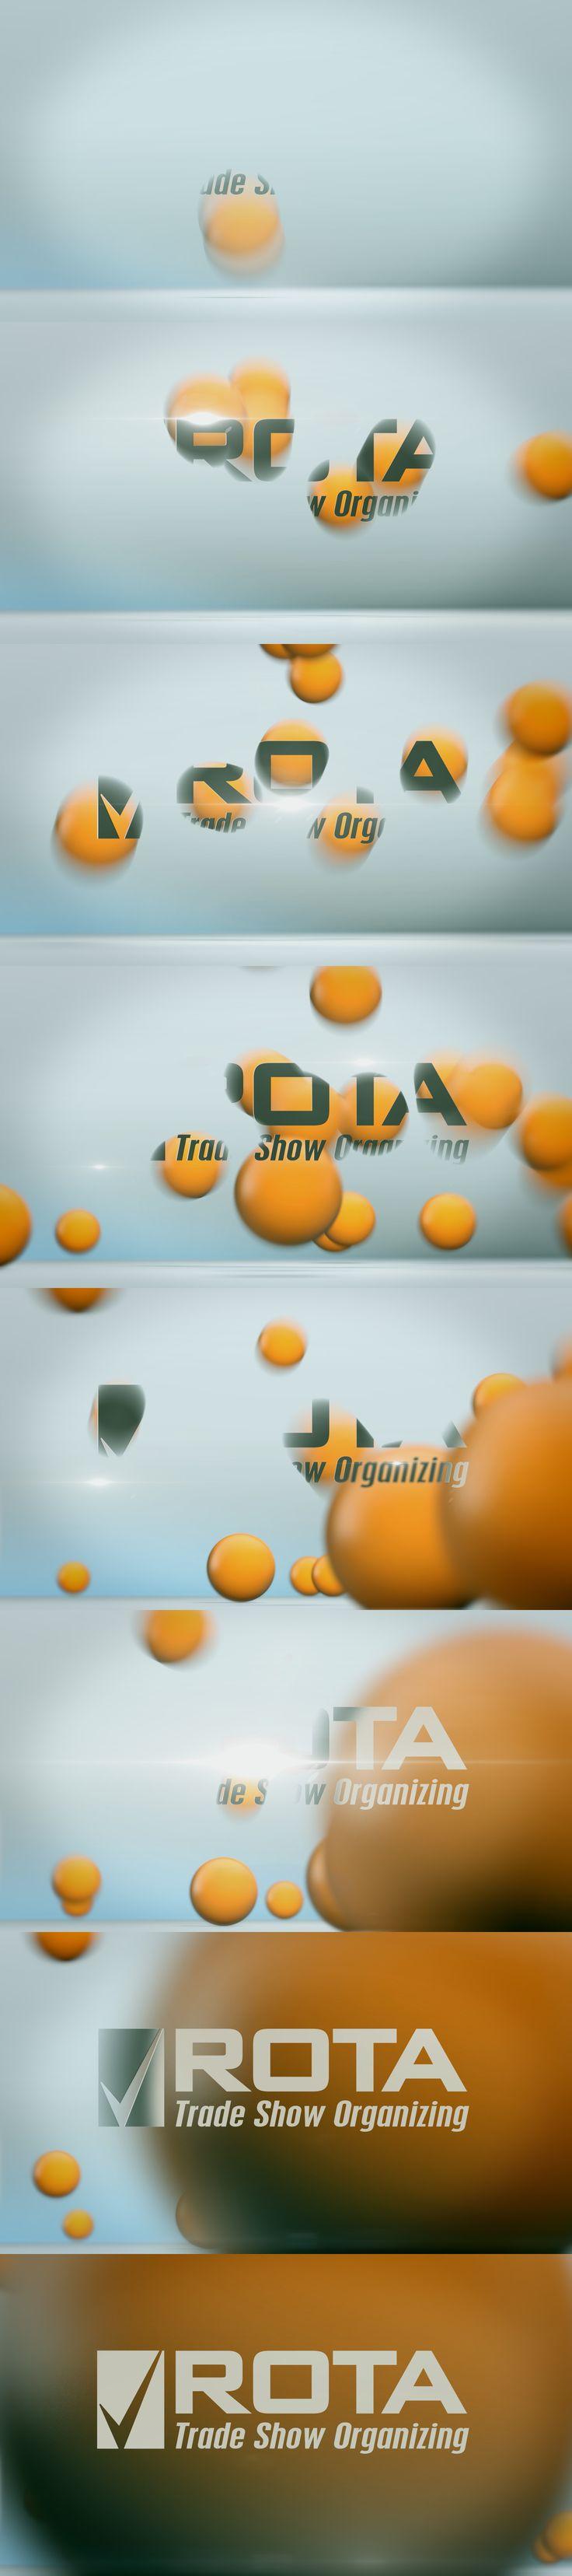 ROTA Trade Show Organizing Pack Shot Animation